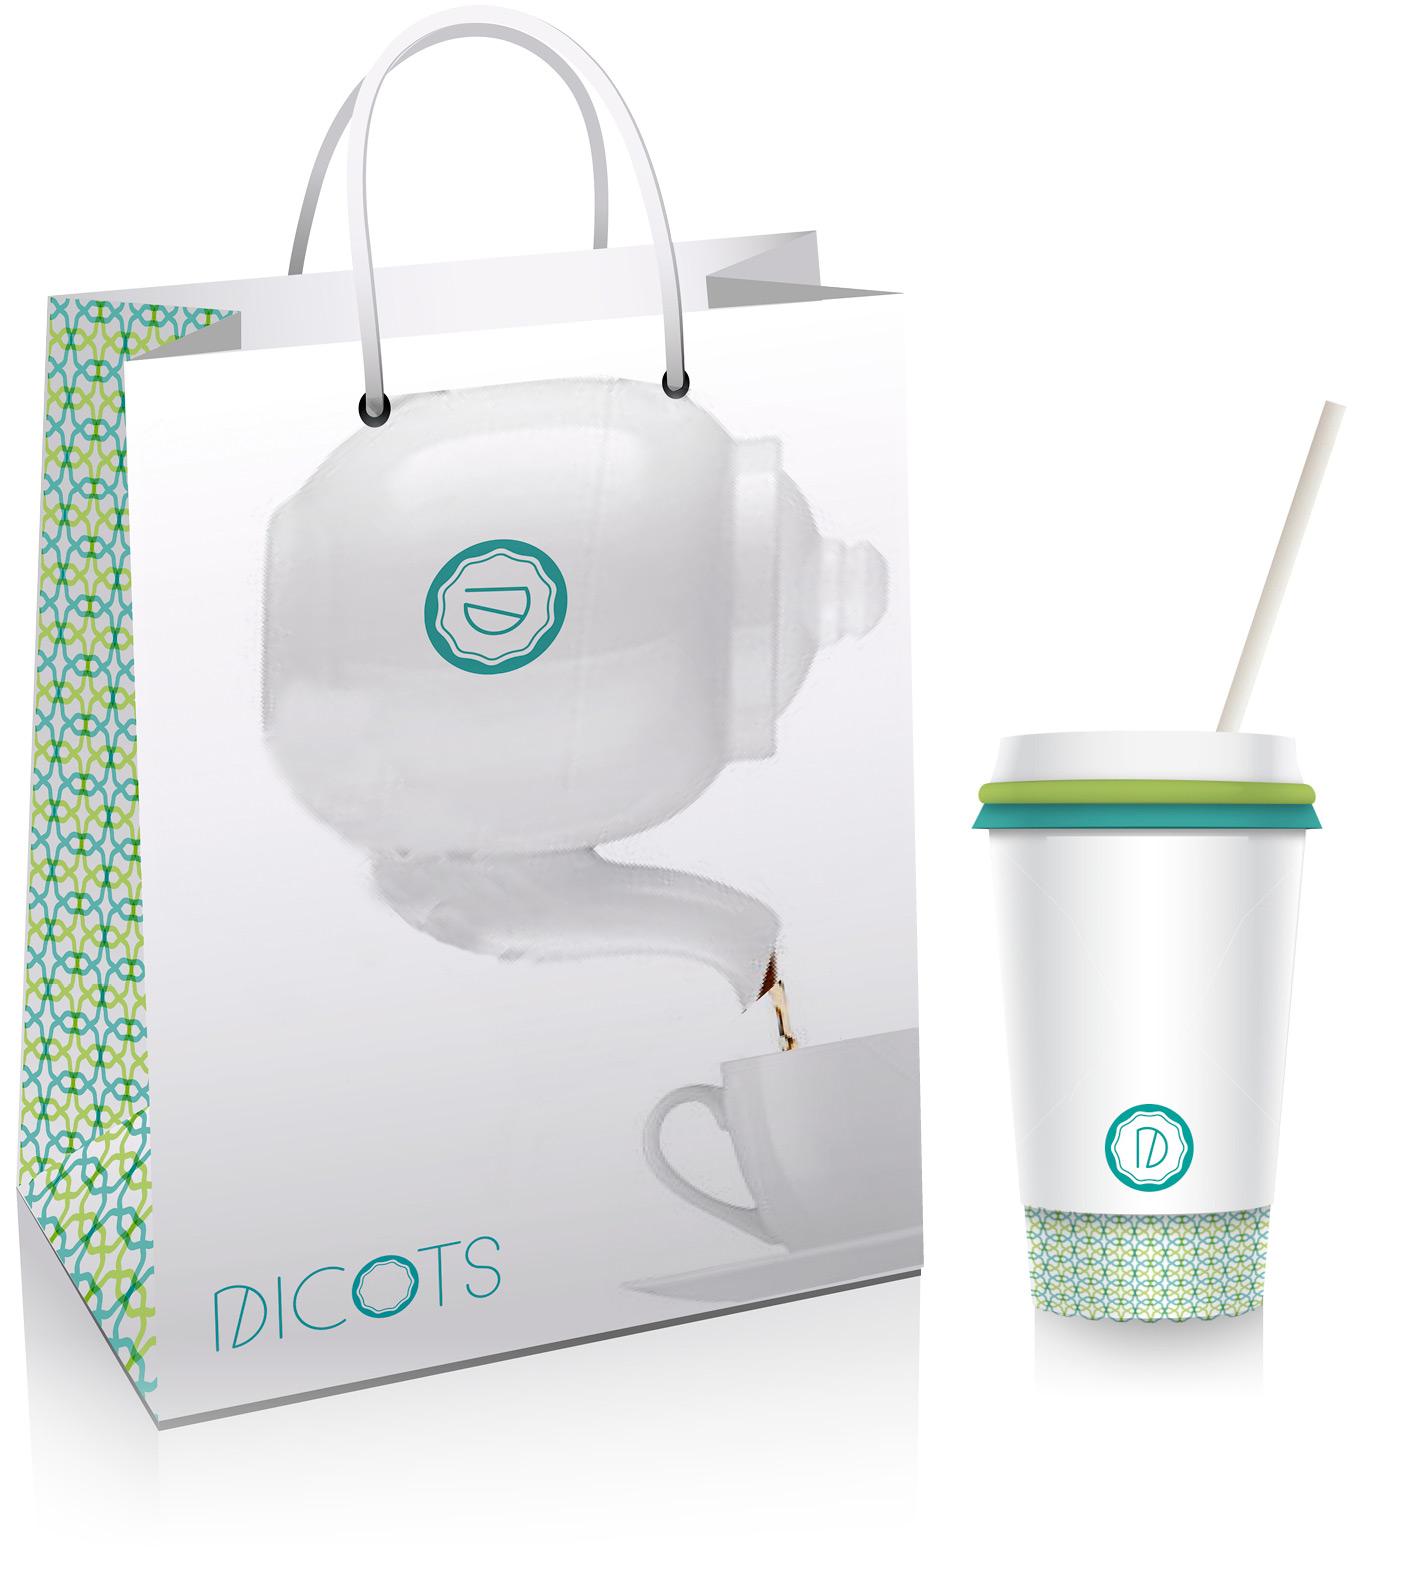 Dicots branding